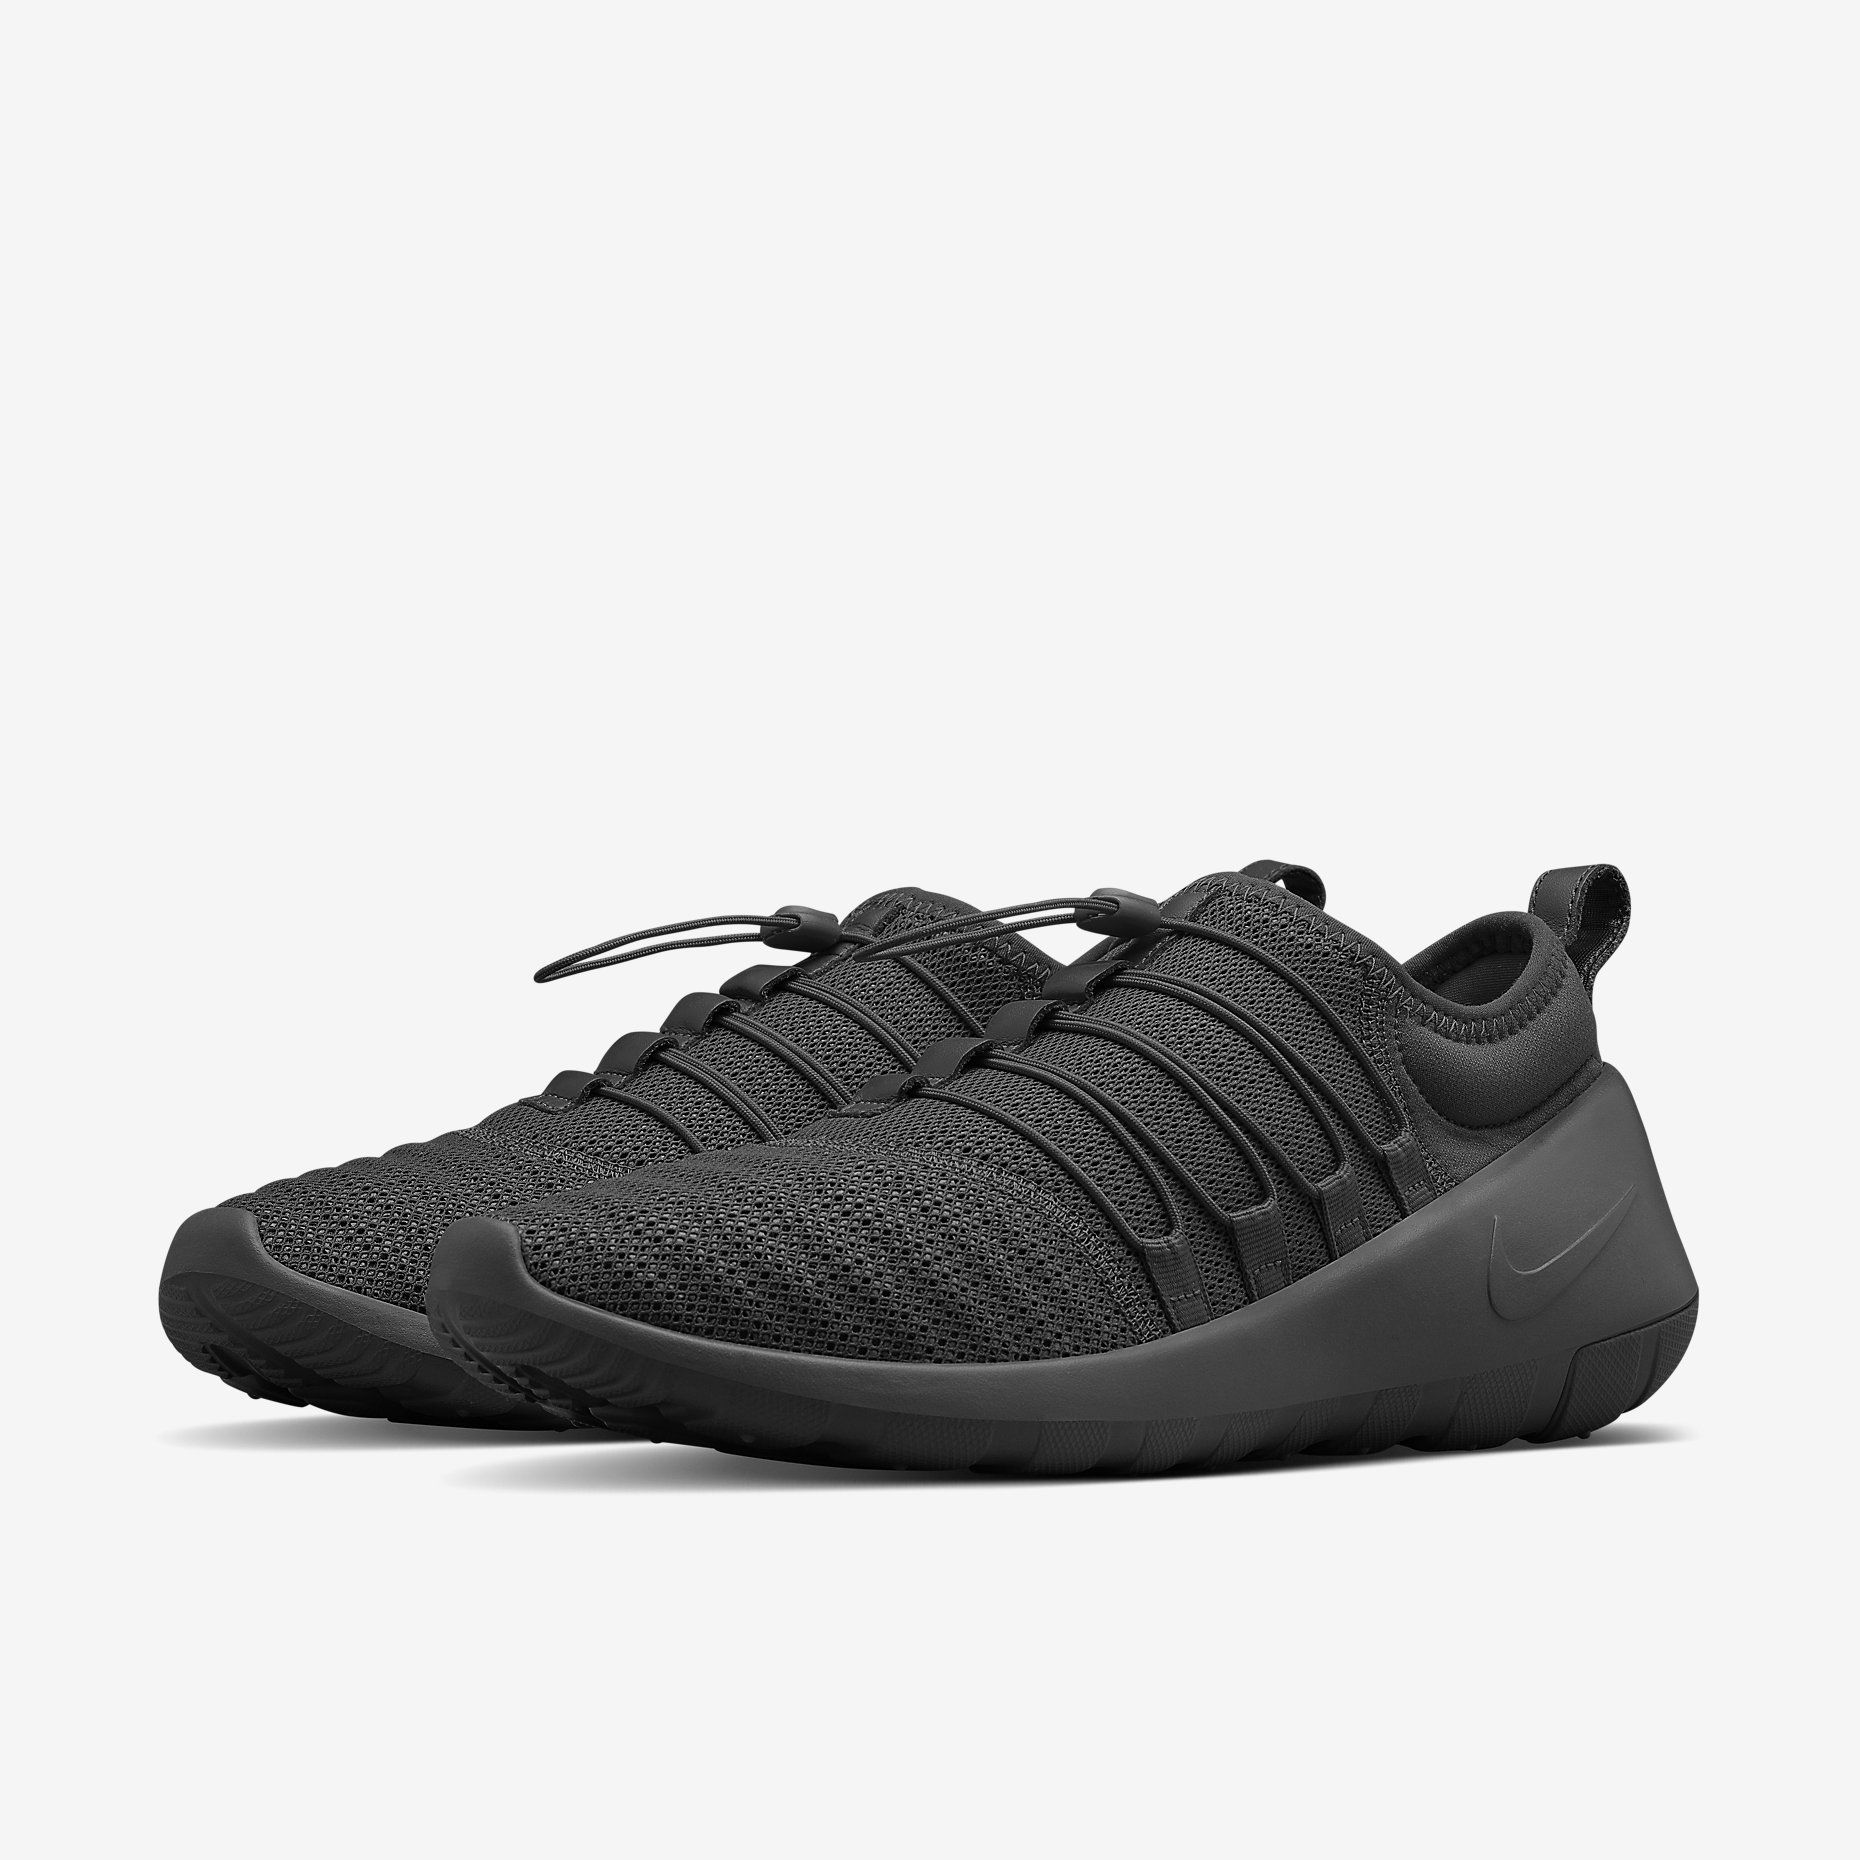 nike dunk de la édition de l'âme - NikeLab Payaa - Cool Sneakers | AMAZING Sneakers | Pinterest ...